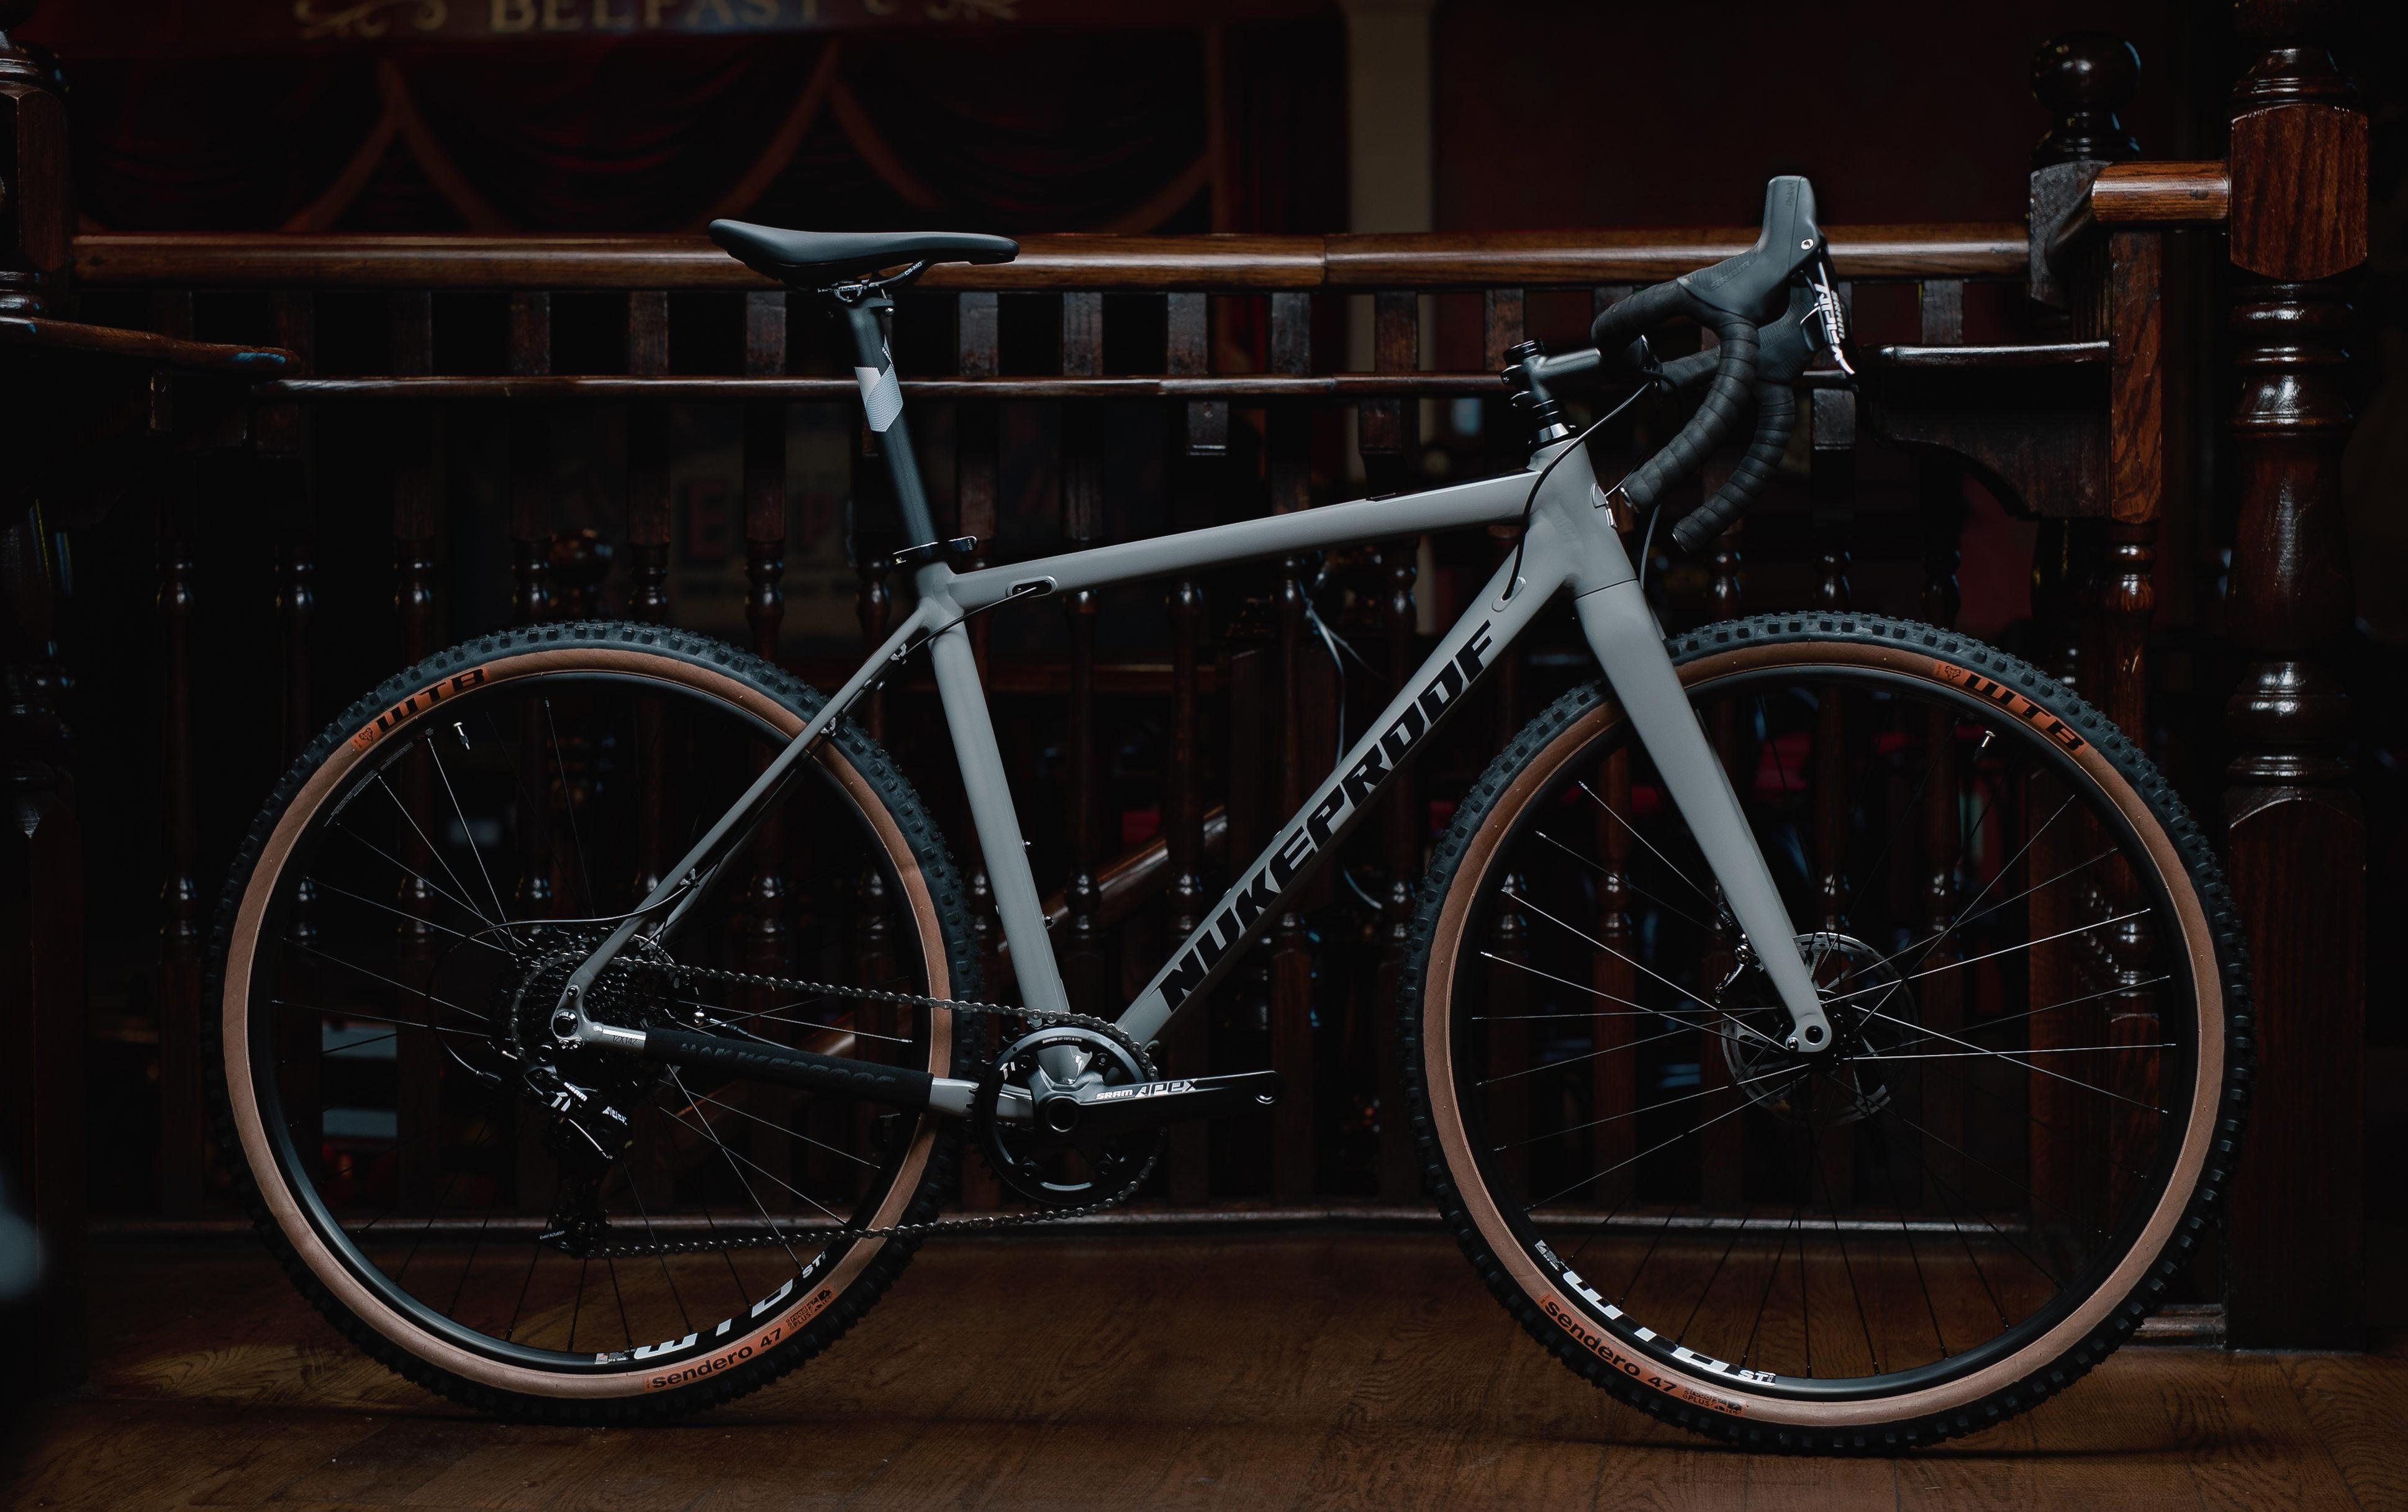 Nukeproof Announces Its 2019 Training Bike For Mountain Bikers